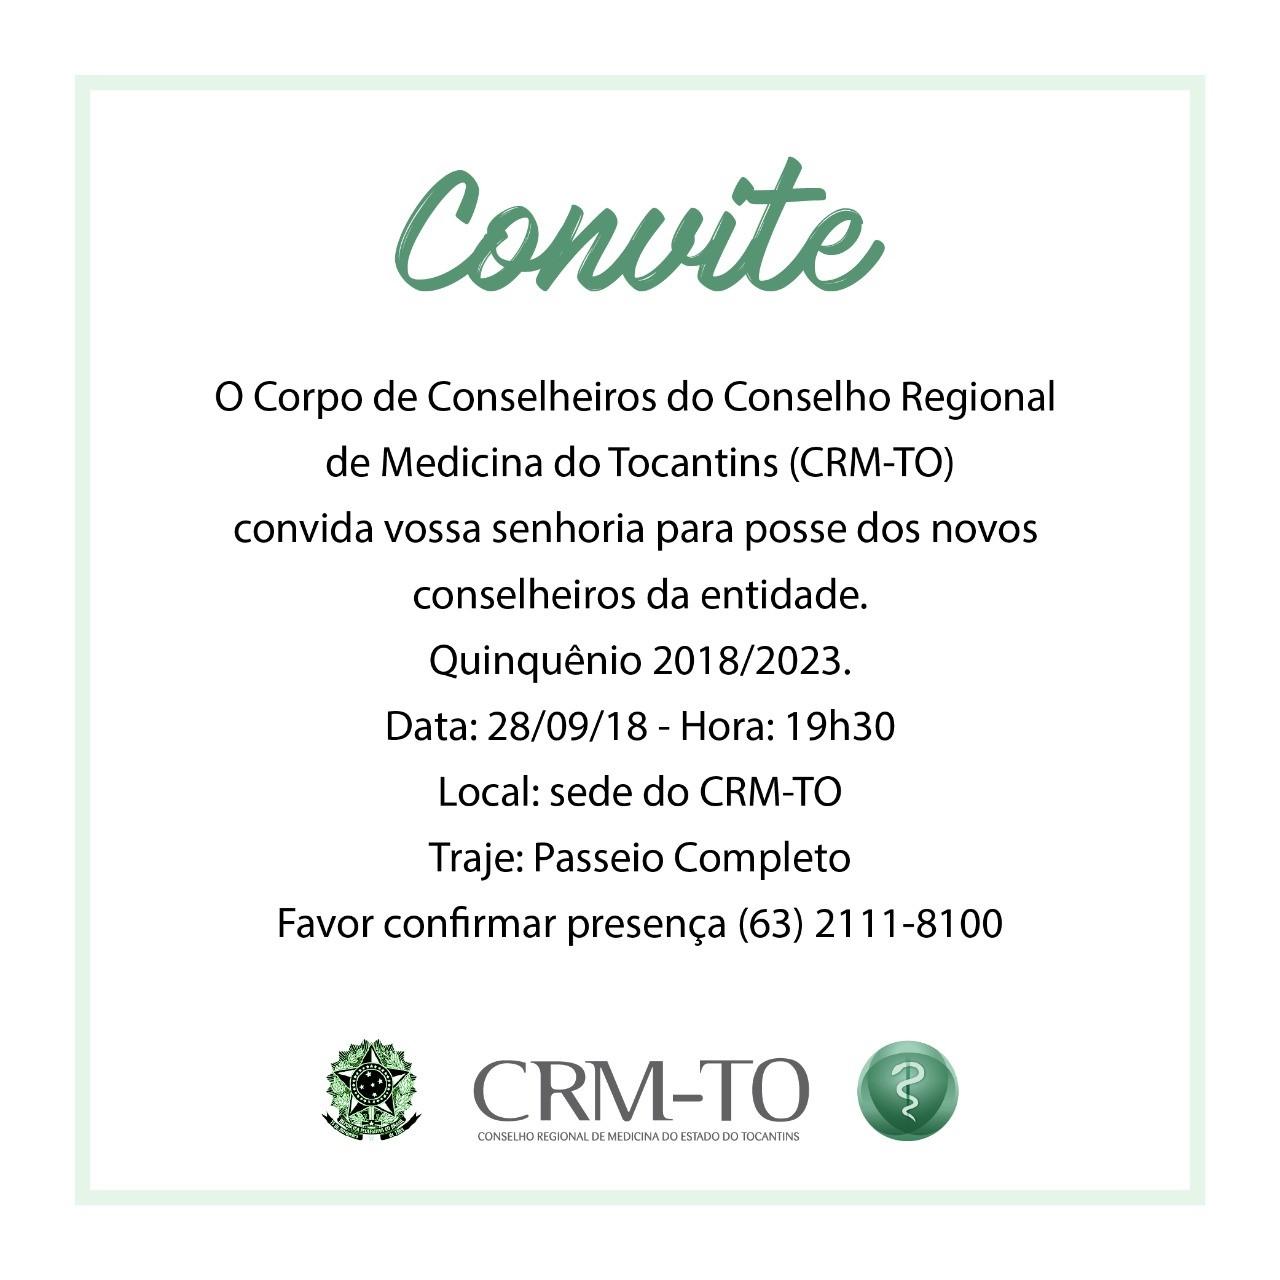 CRM-TO dará posse ao novo Corpo de Conselheiros nesta sexta-feira